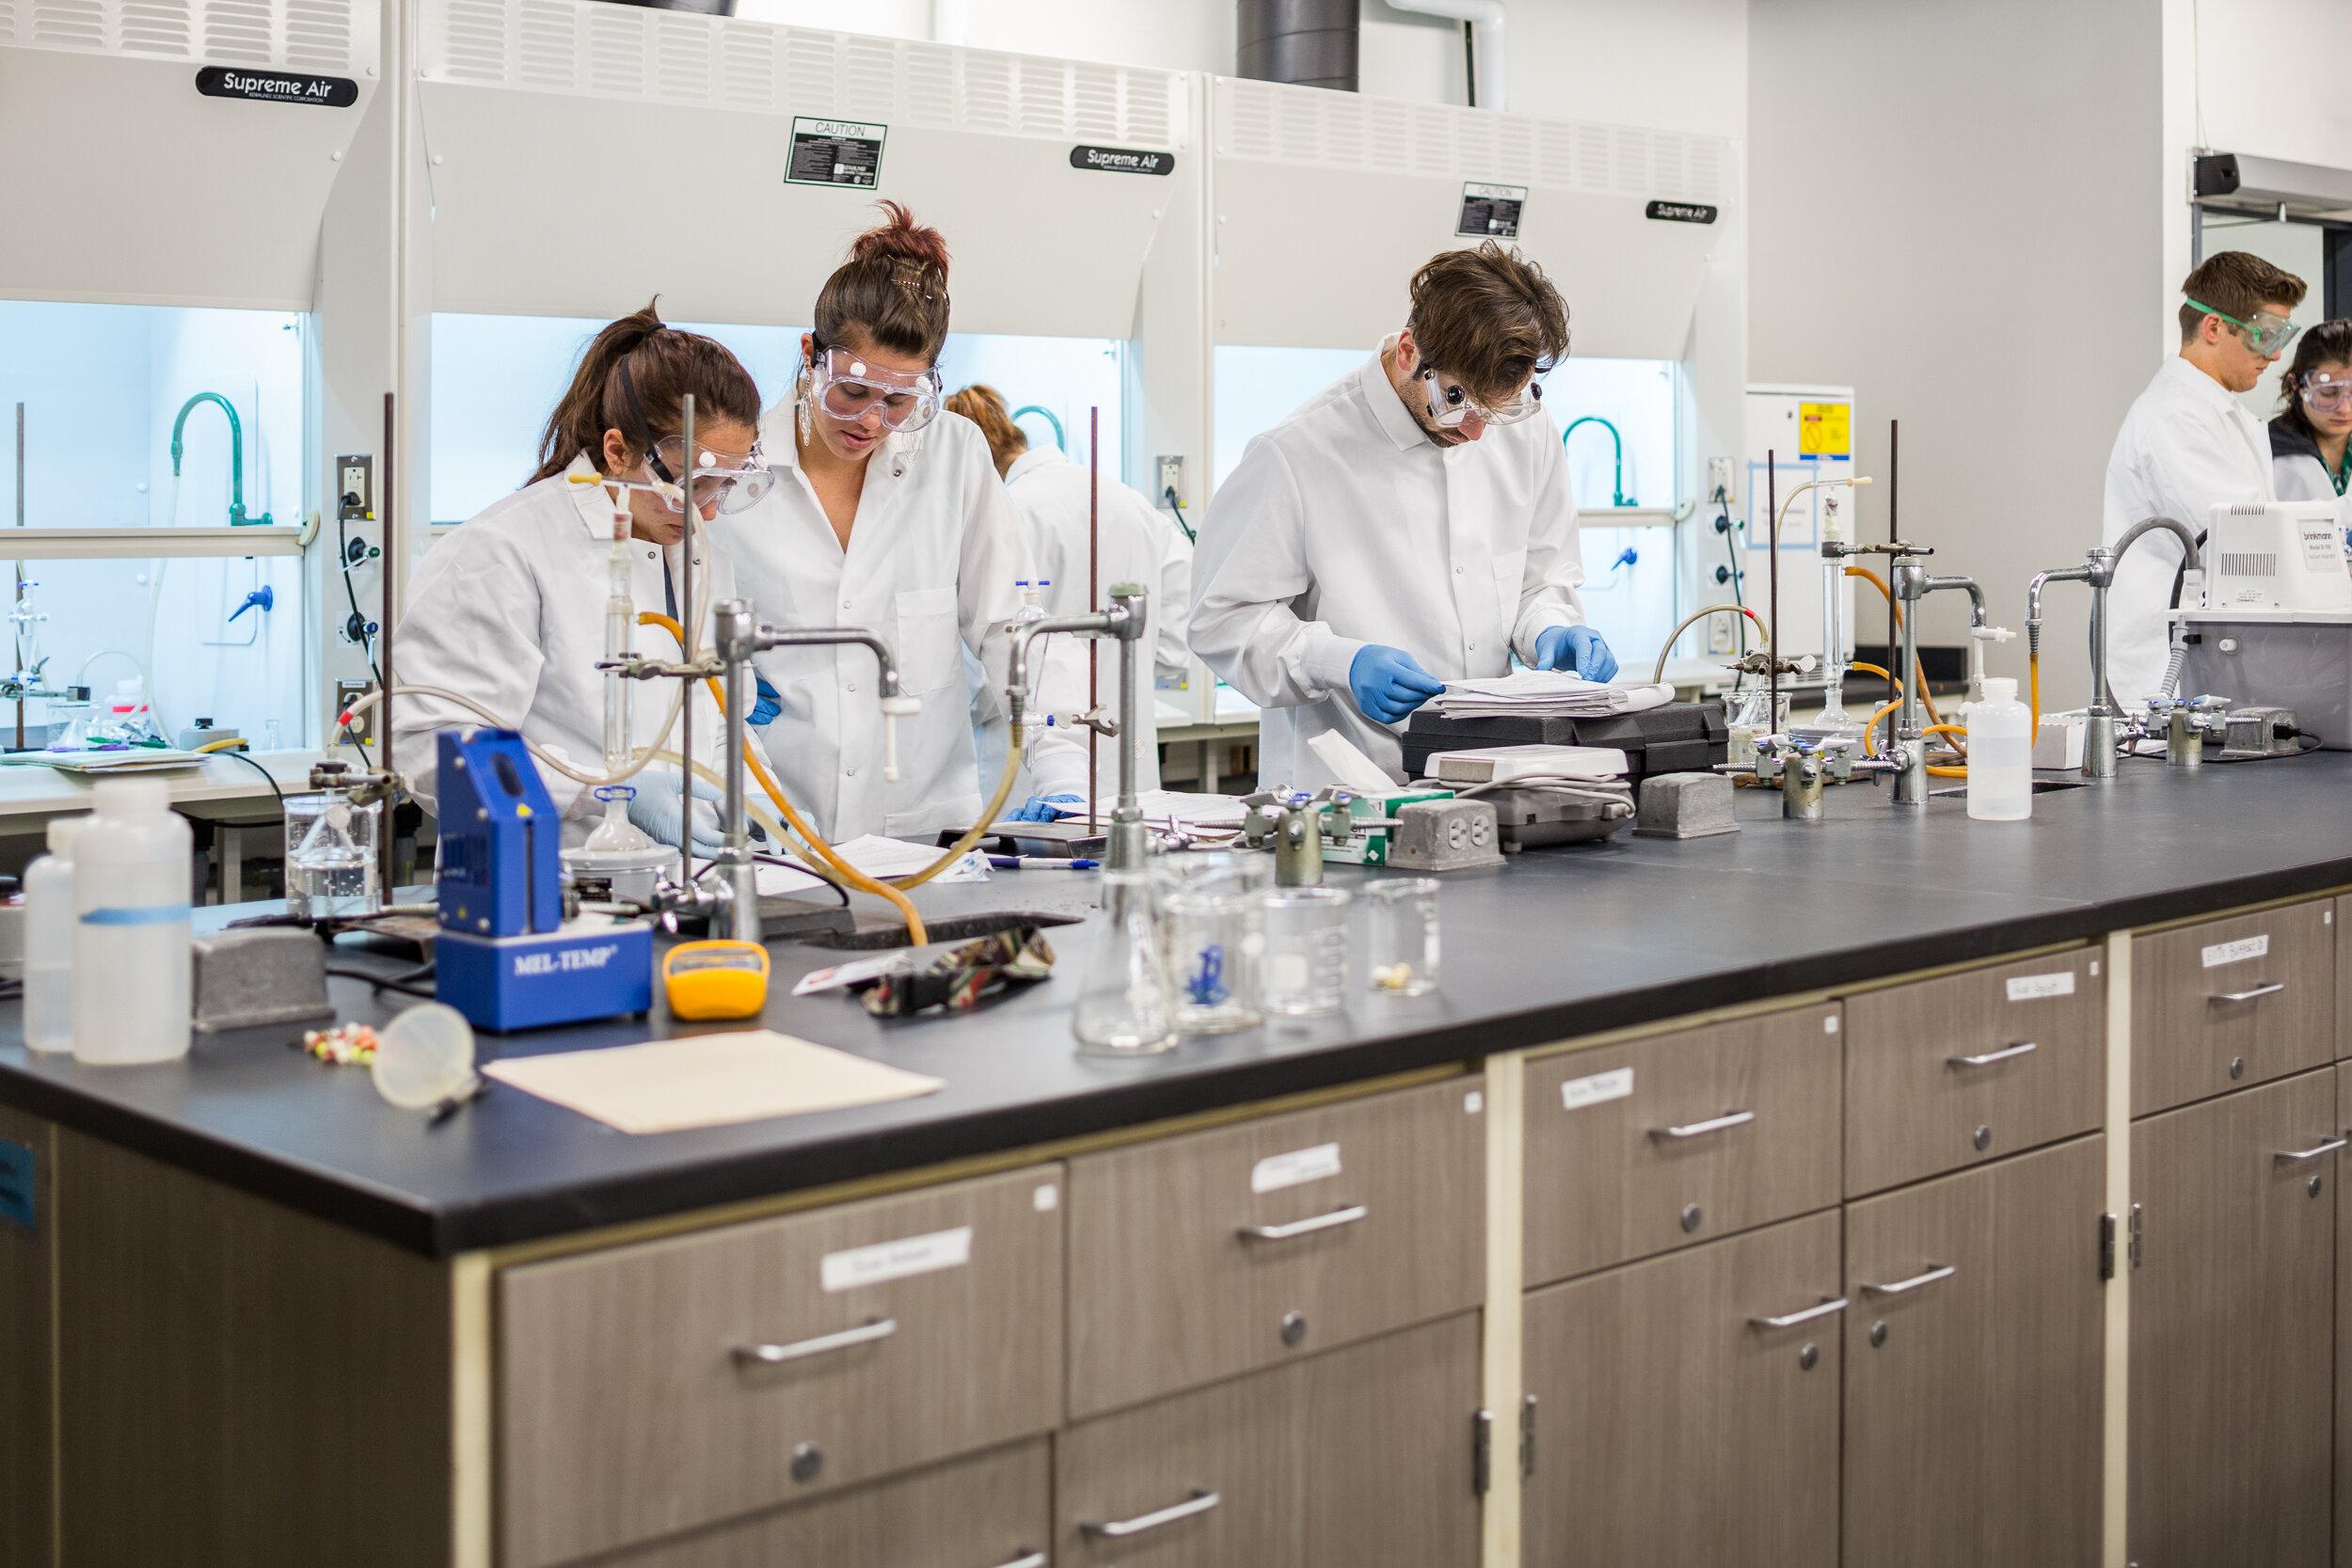 66-LewisClark-Lab-JoshPartee-3988-chem-students.jpg